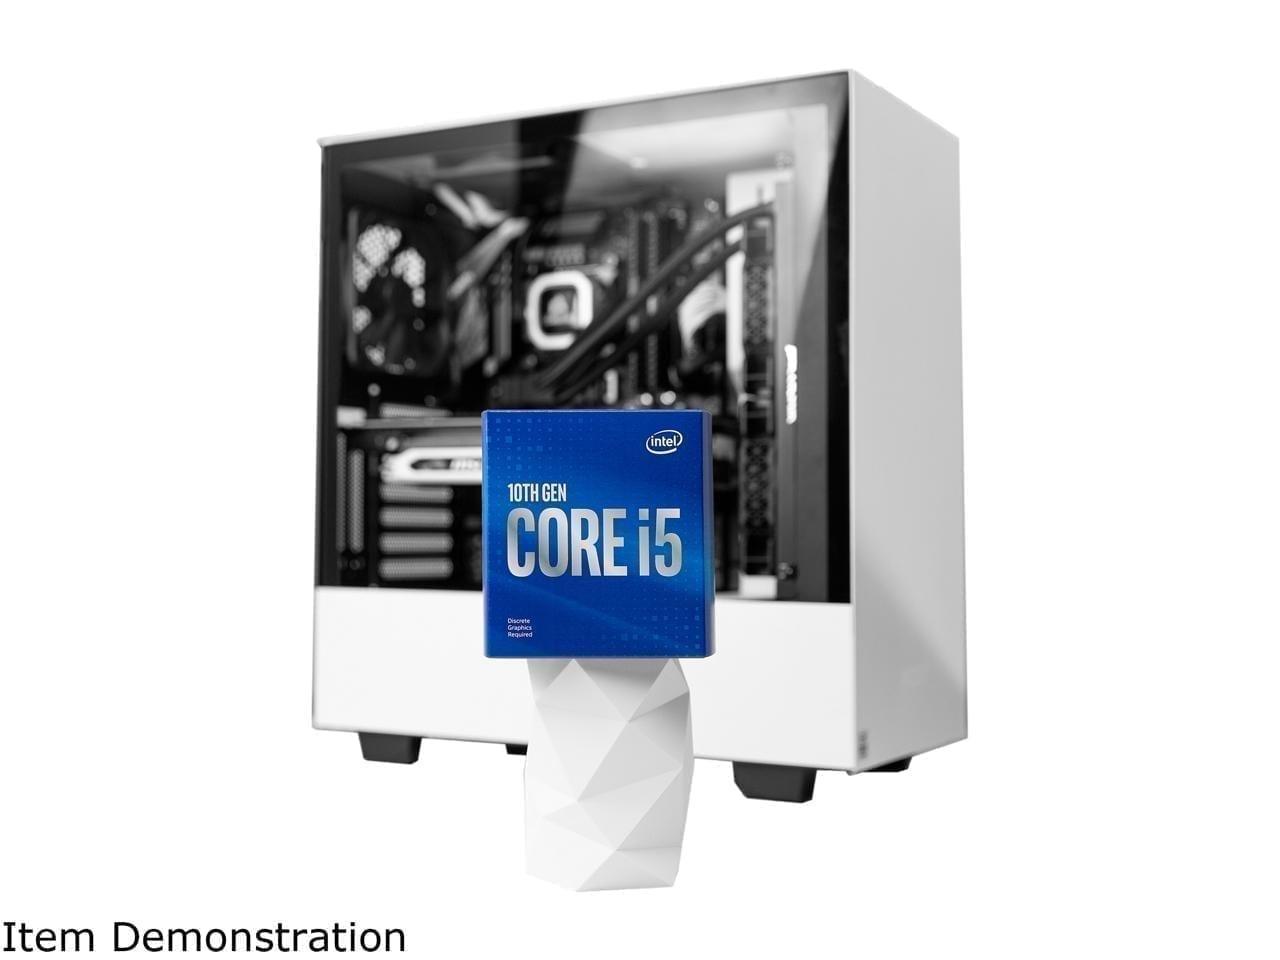 Intel Core i5-10400 Comet Lake 6-Core 2.9 GHz LGA 1200 65W BX8070110400 Desktop Processor Intel UHD Graphics 630 3